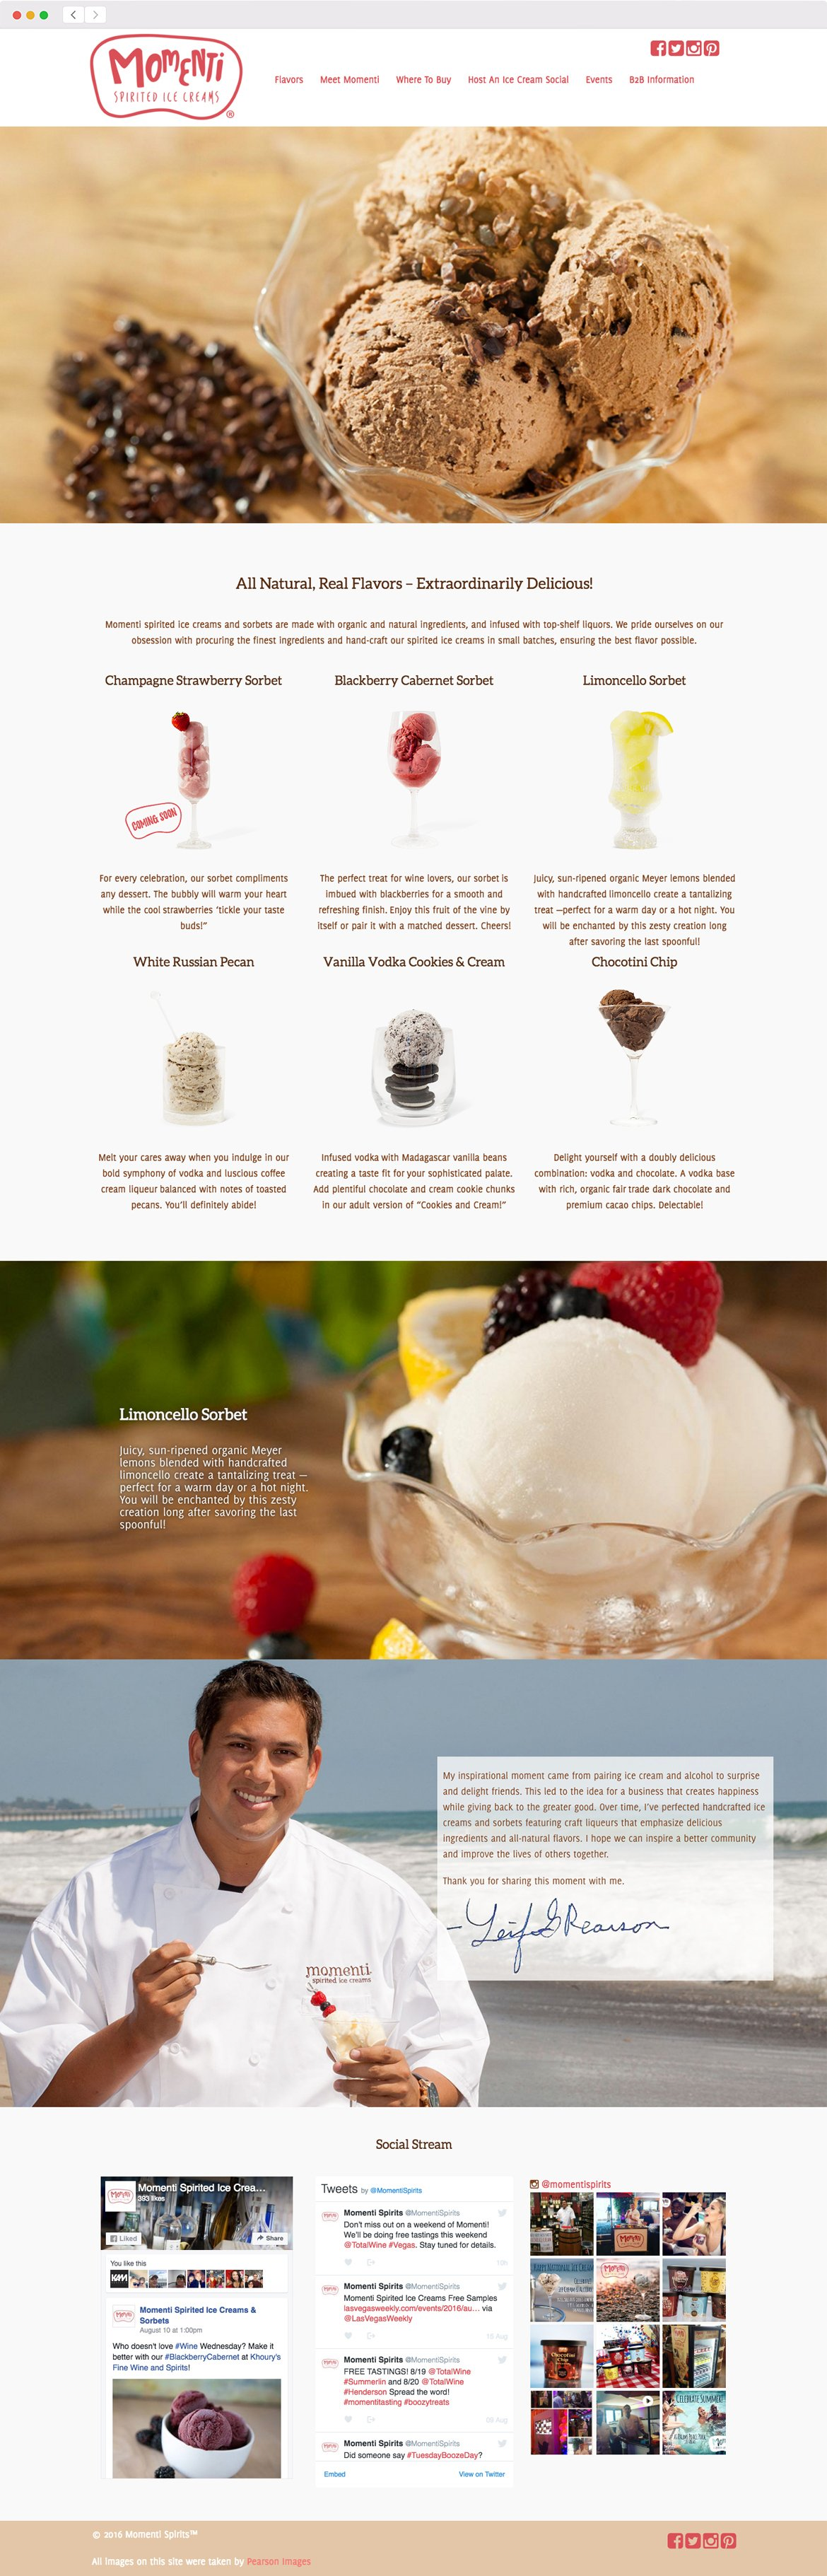 Momenti Spirited Ice Cream Web